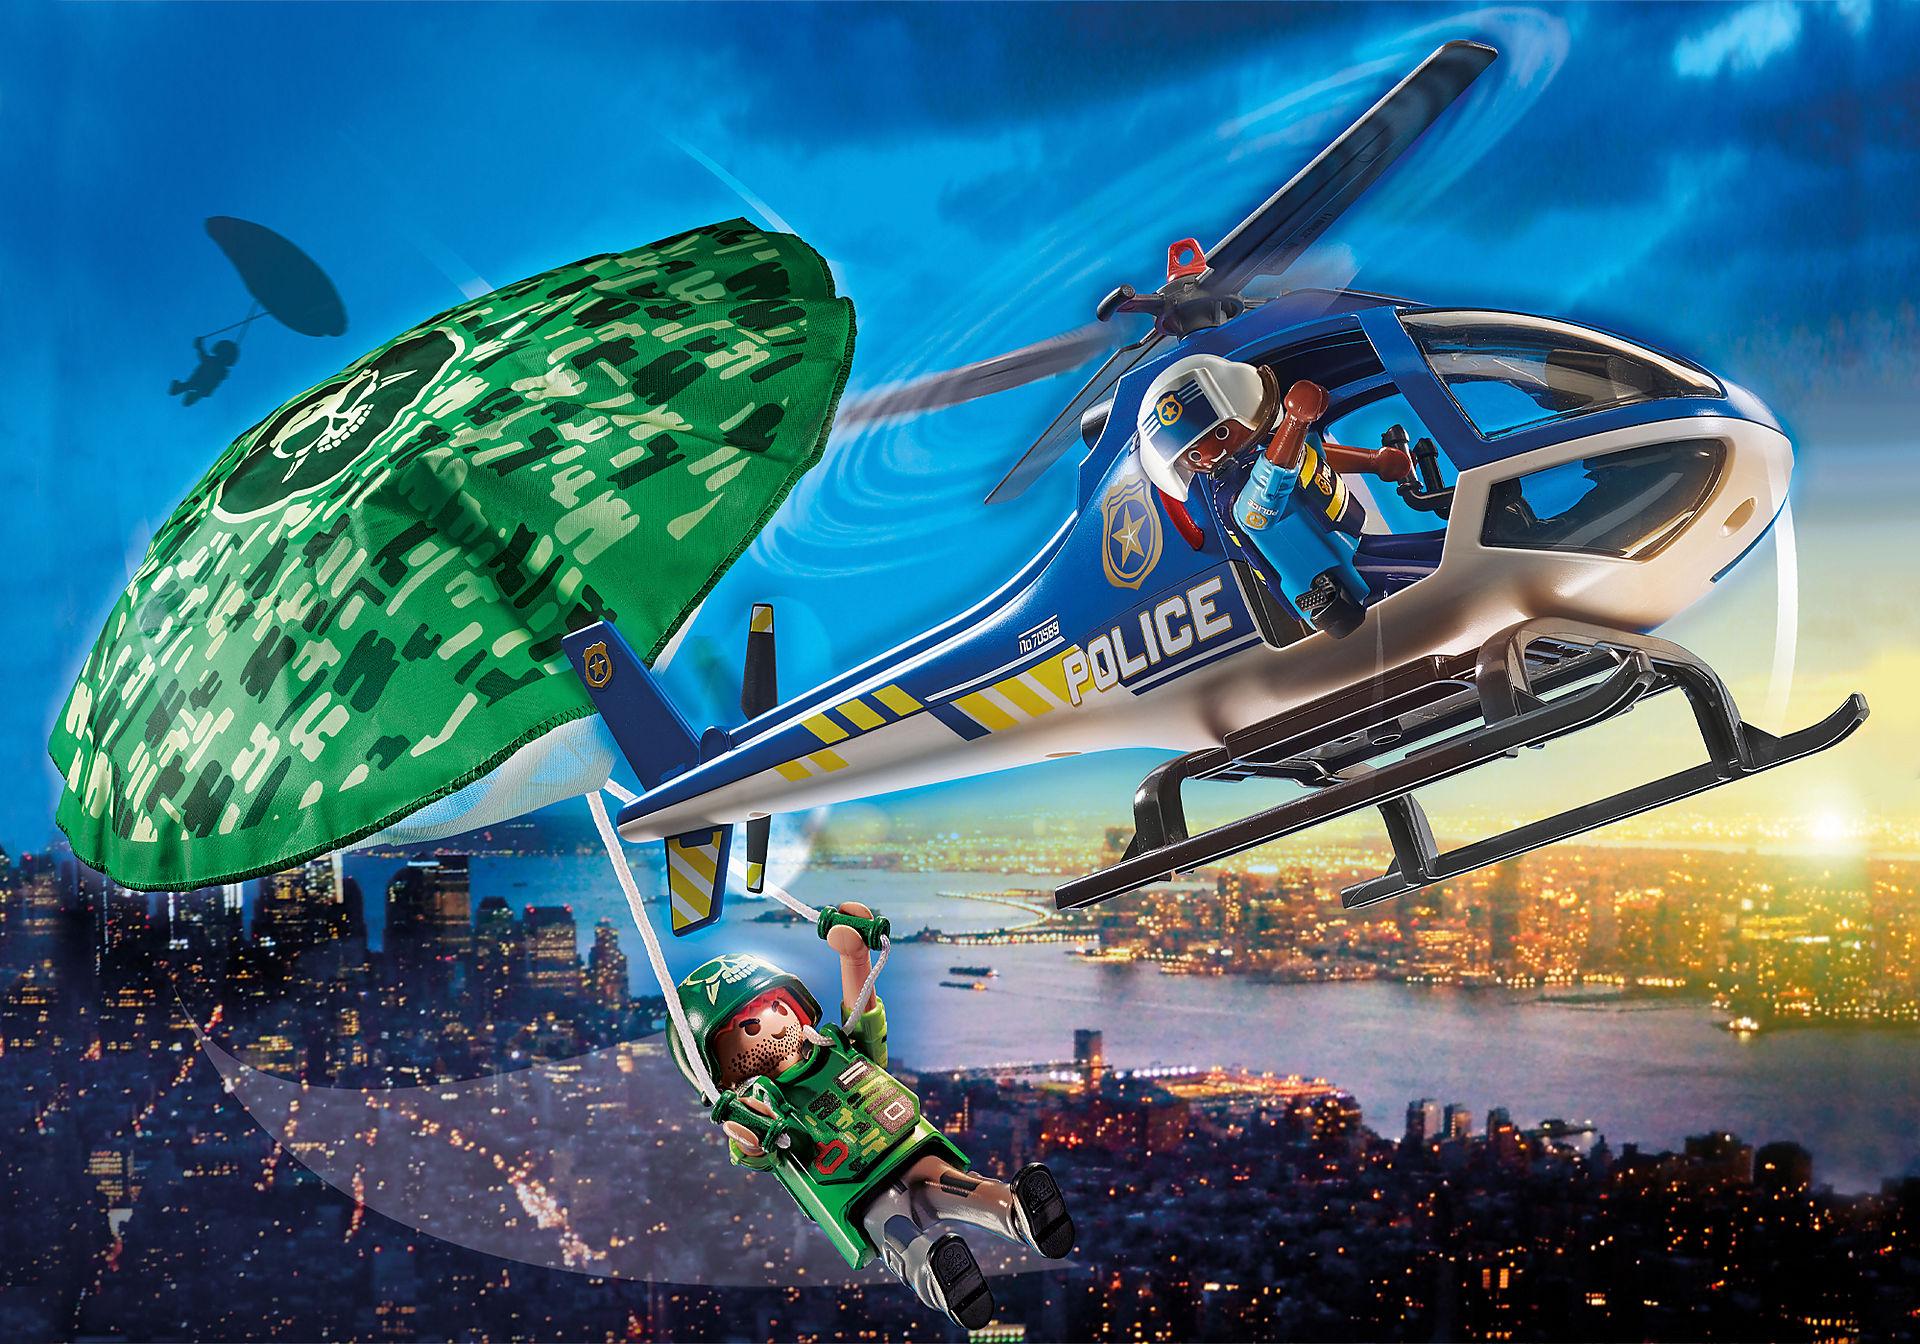 70569 Helicóptero de Policía: persecución en paracaídas zoom image1